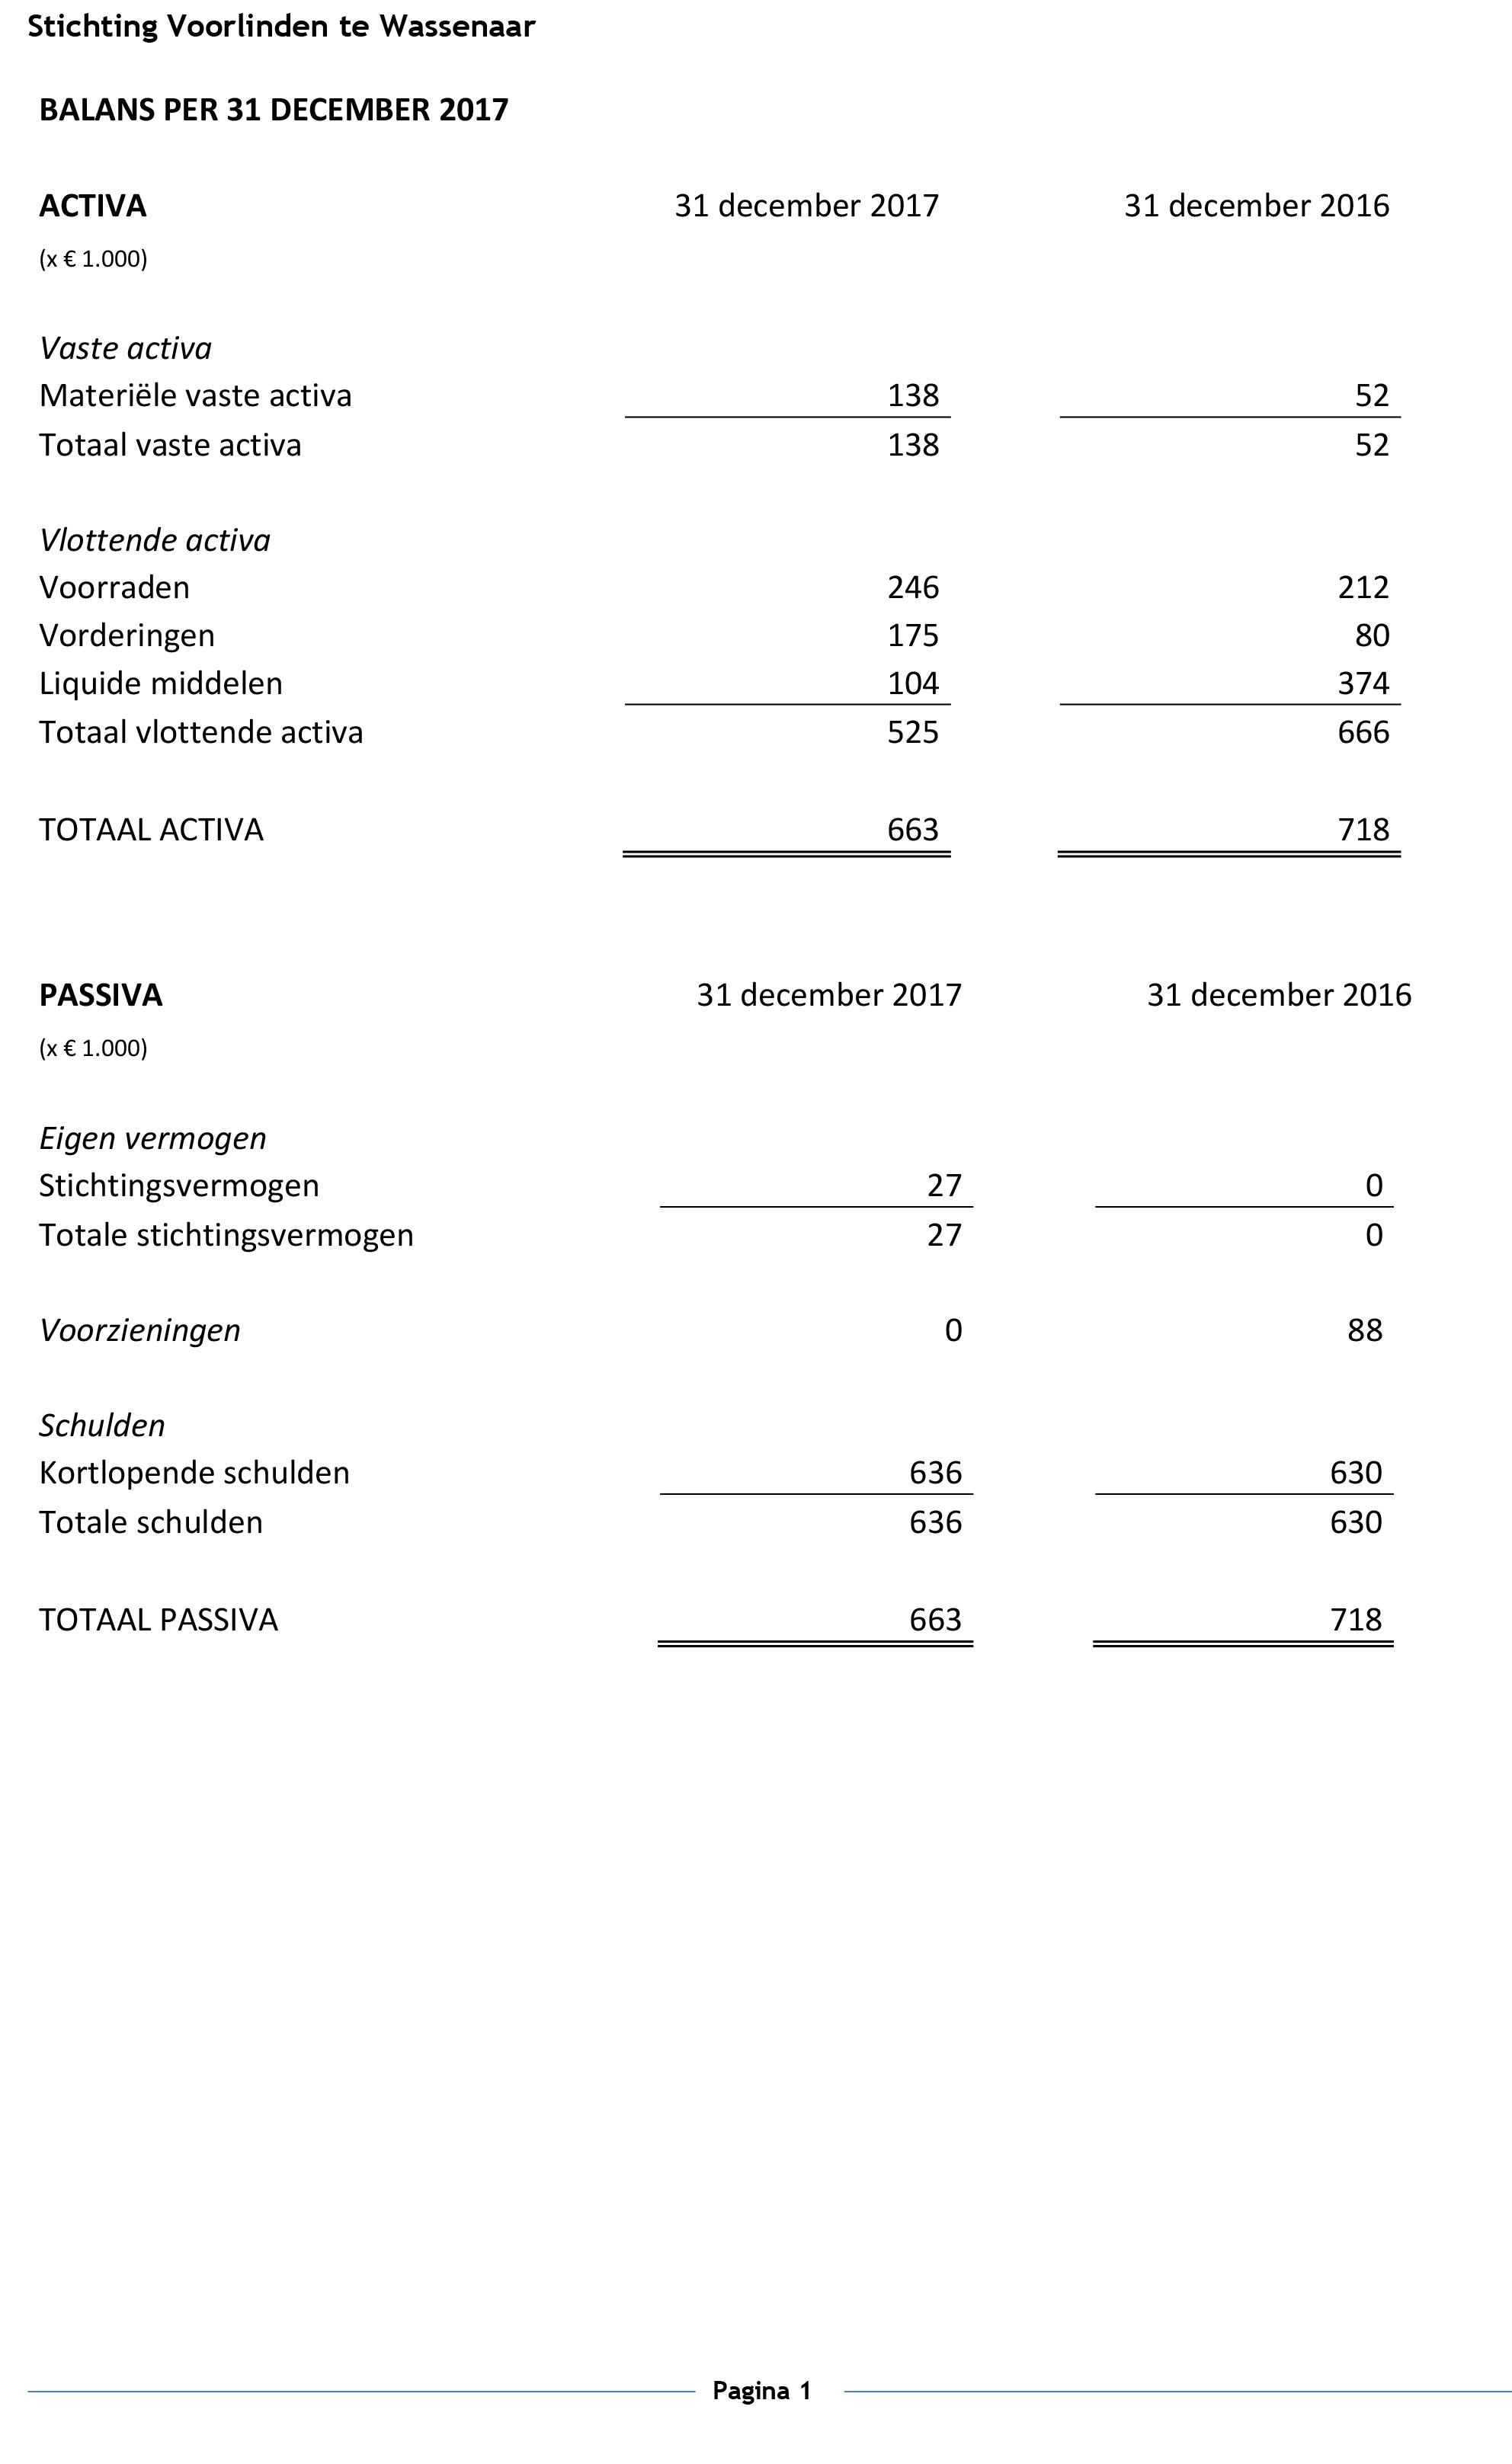 ANBI Cijfers website 2017 30-4-2018-1